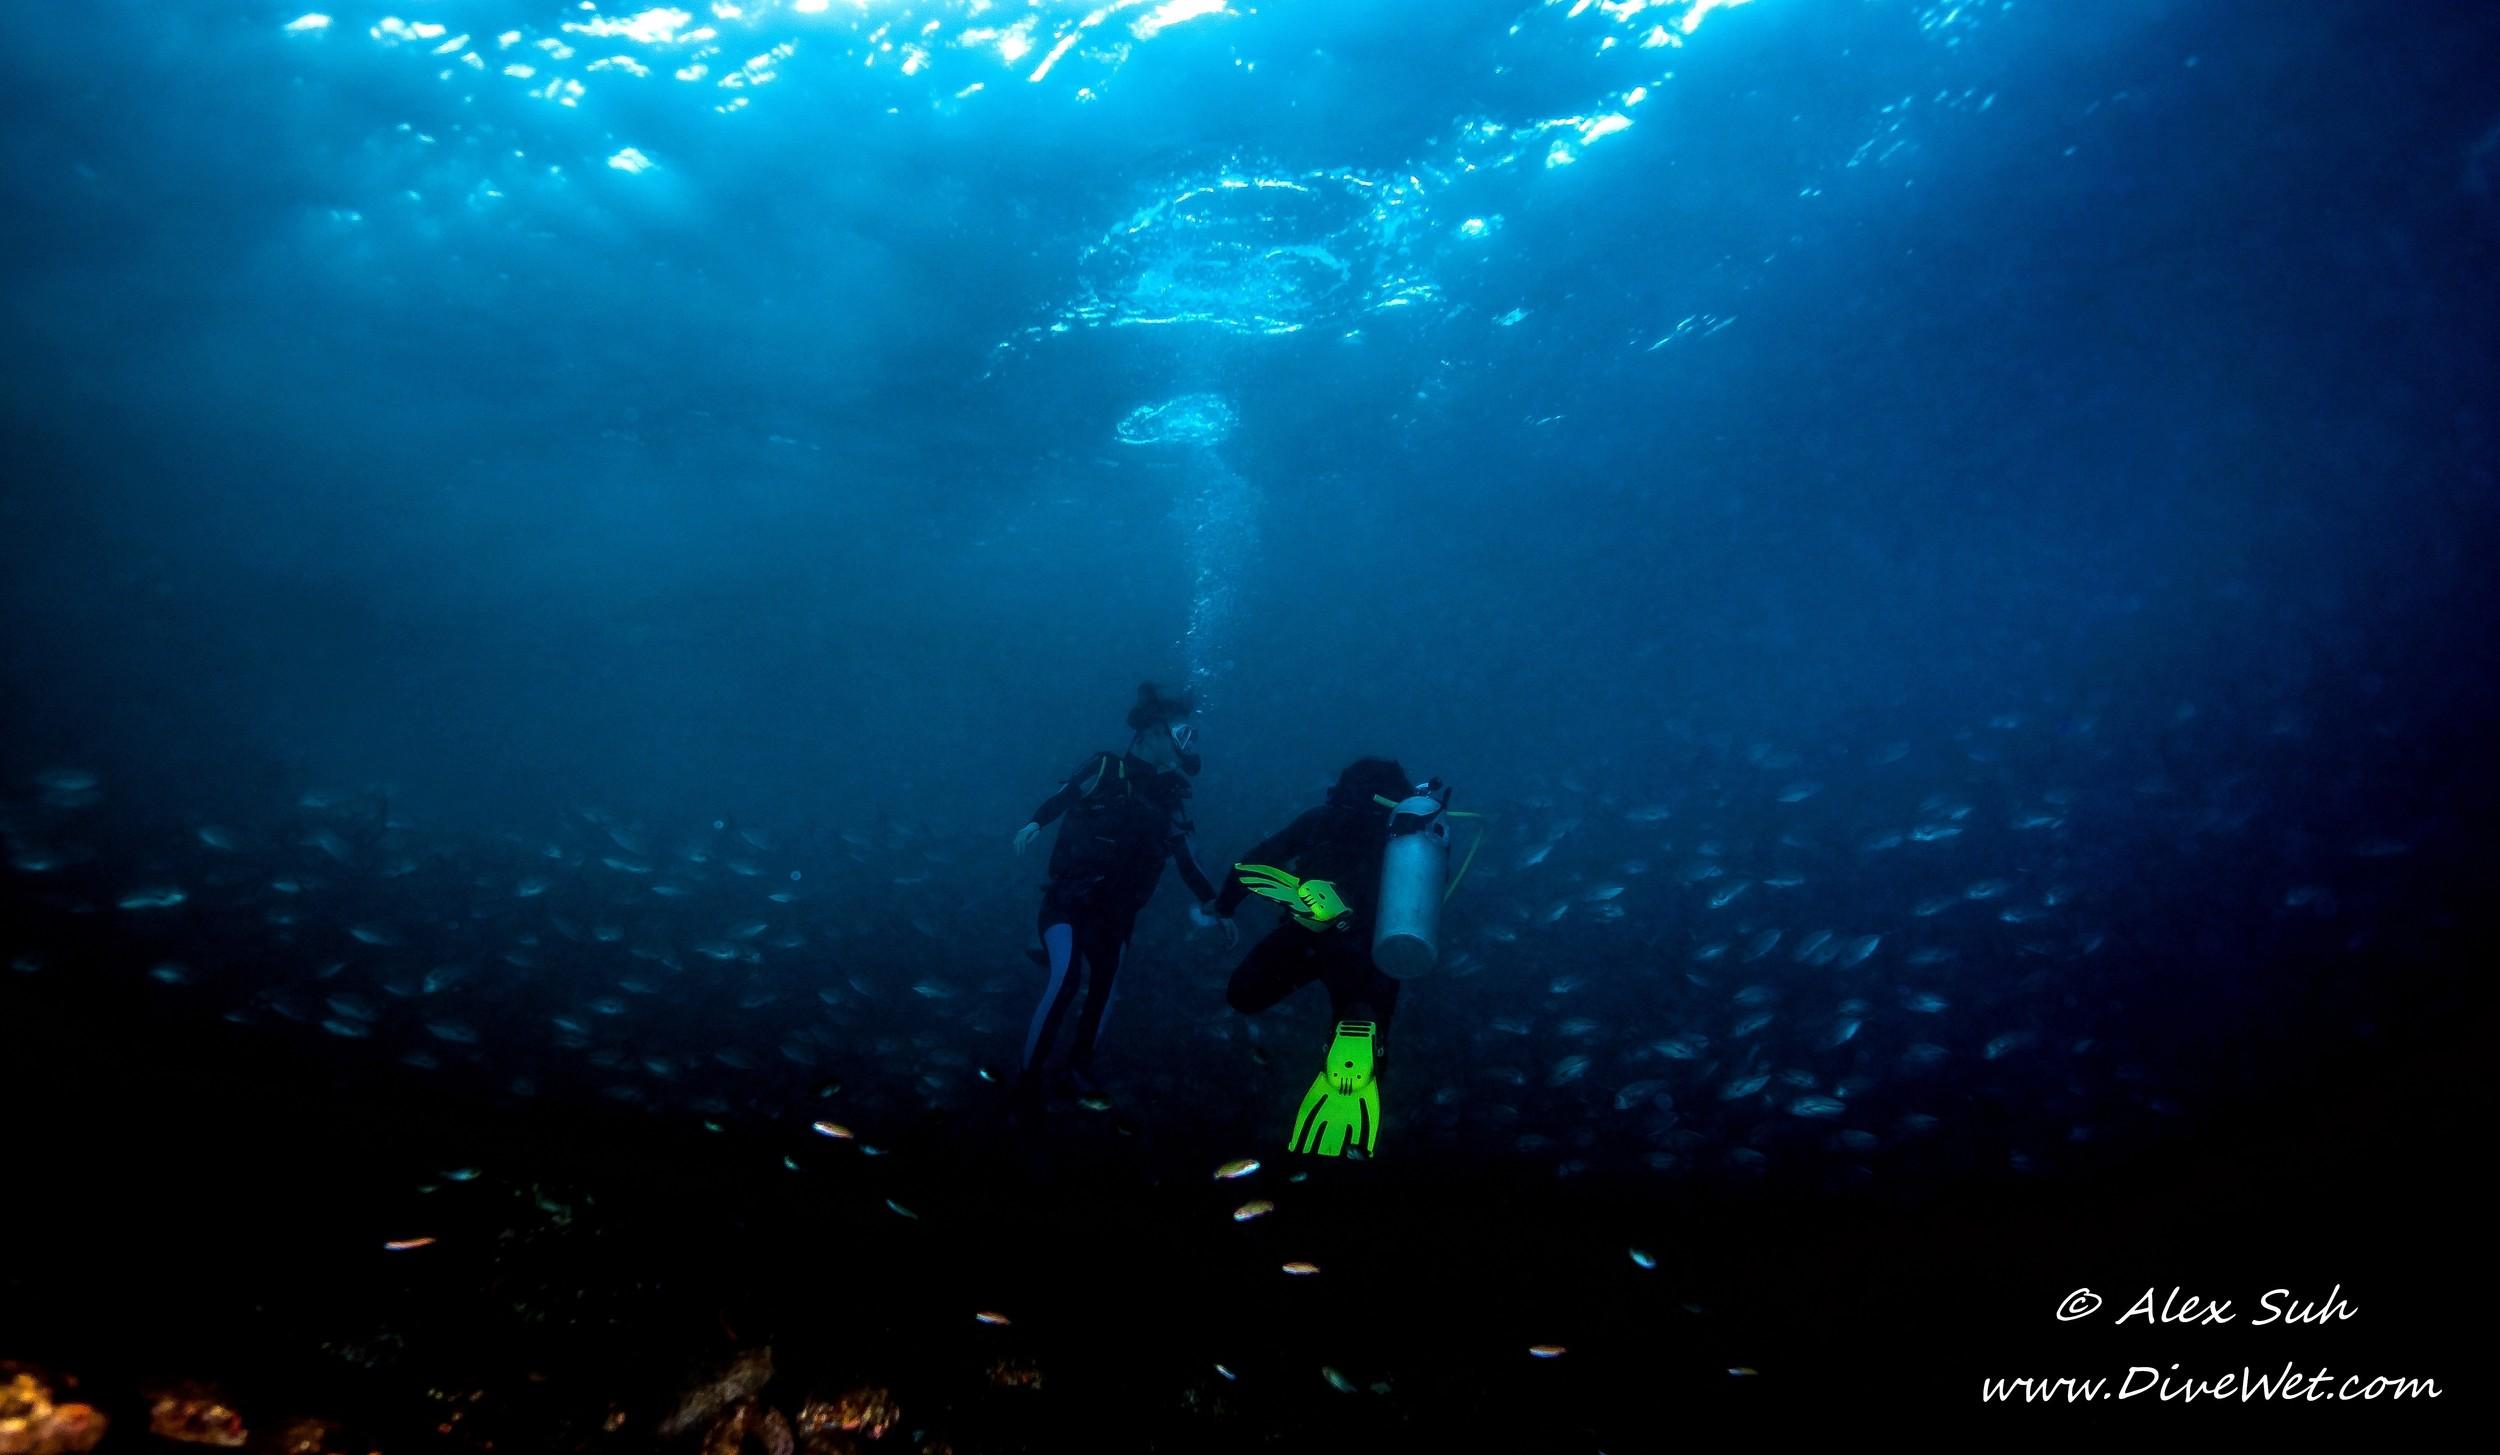 Divers in School of Jacks in Bali